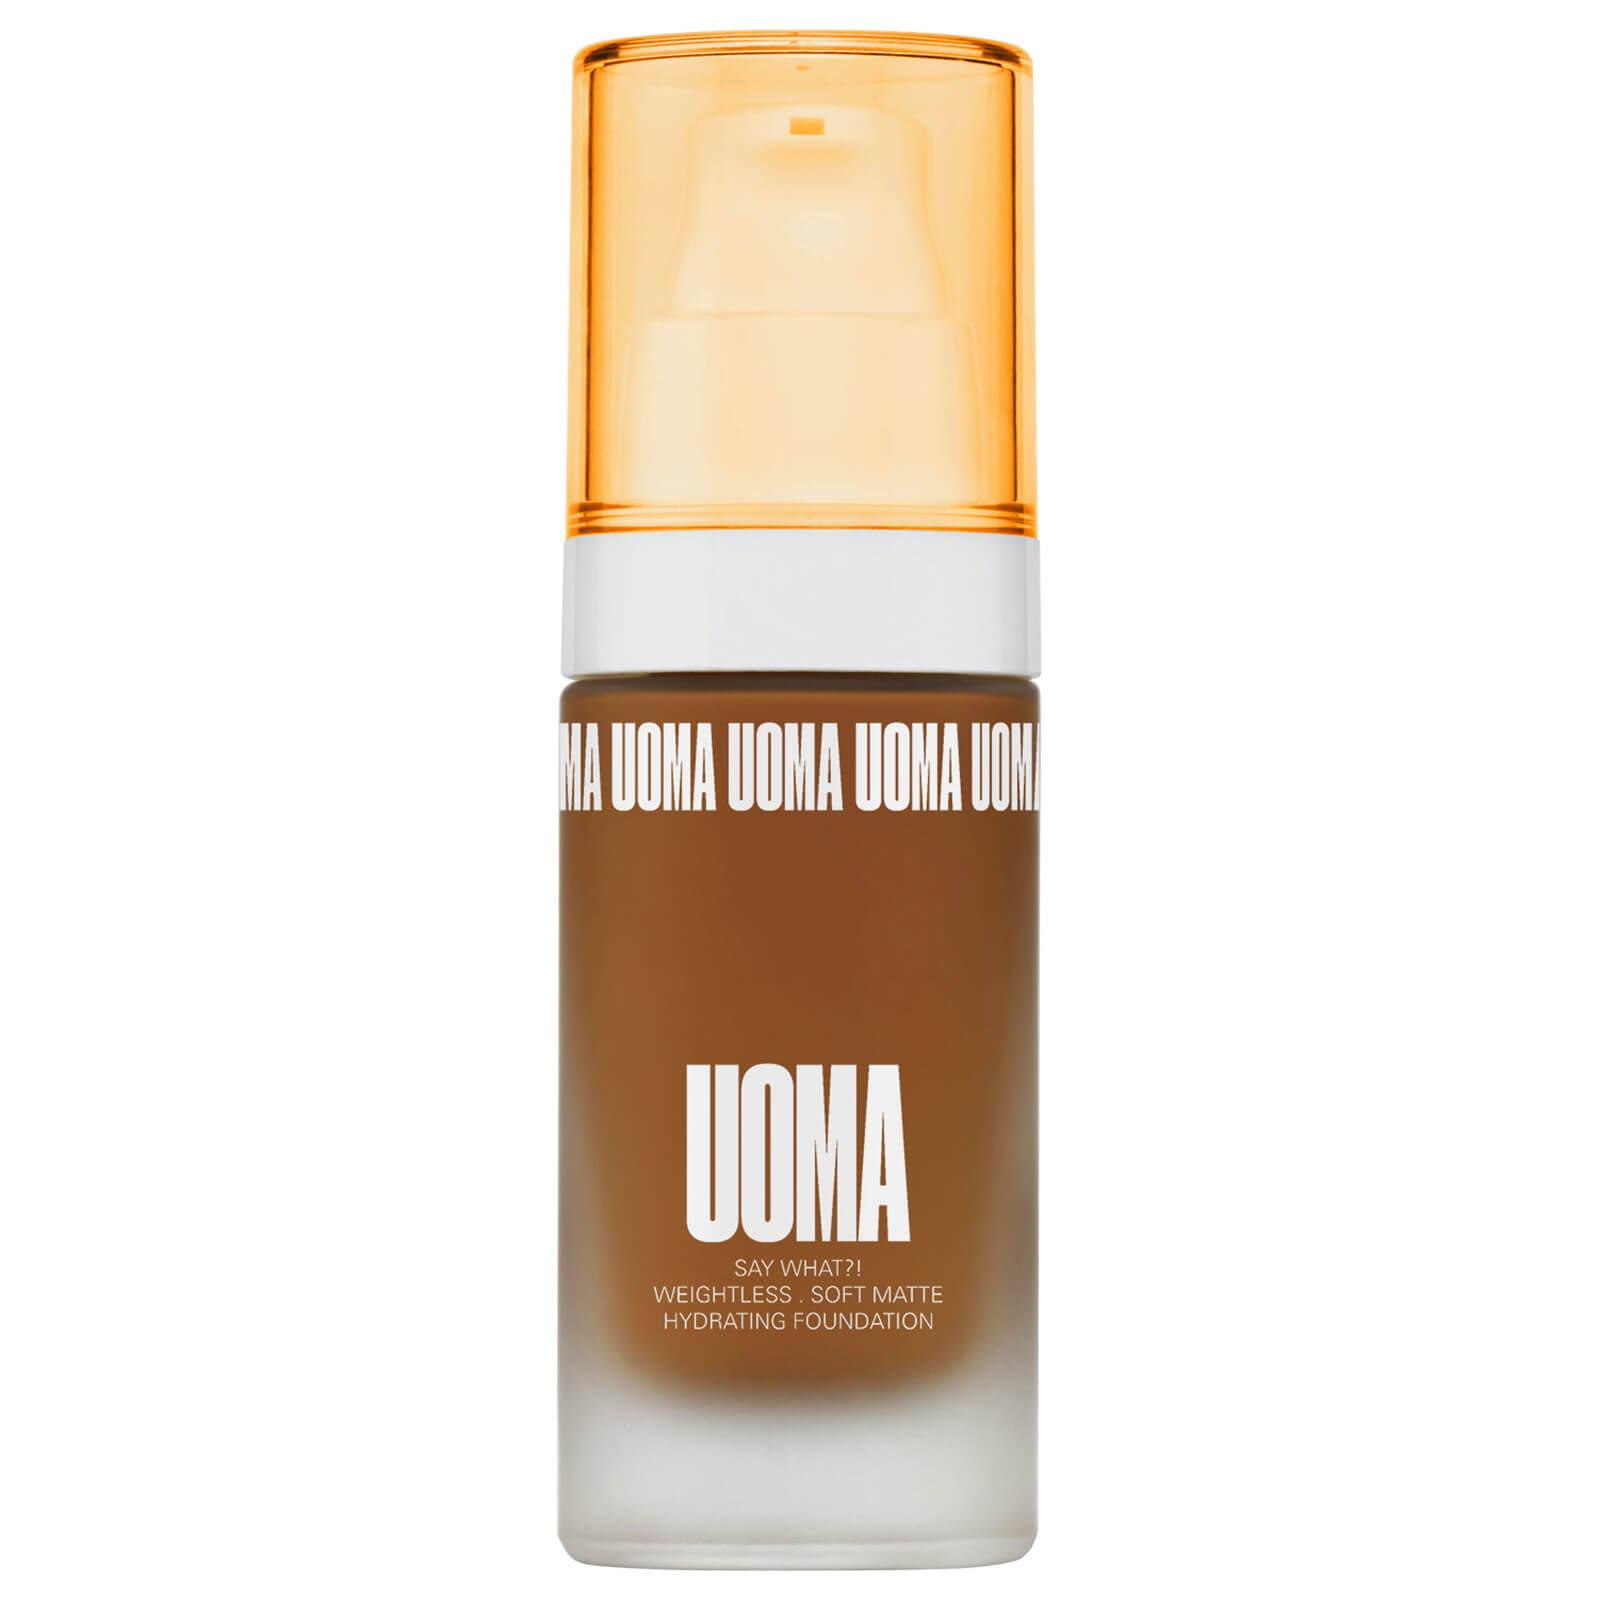 Купить UOMA Beauty Say What Foundation 30ml (Various Shades) - Brown Sugar T3N